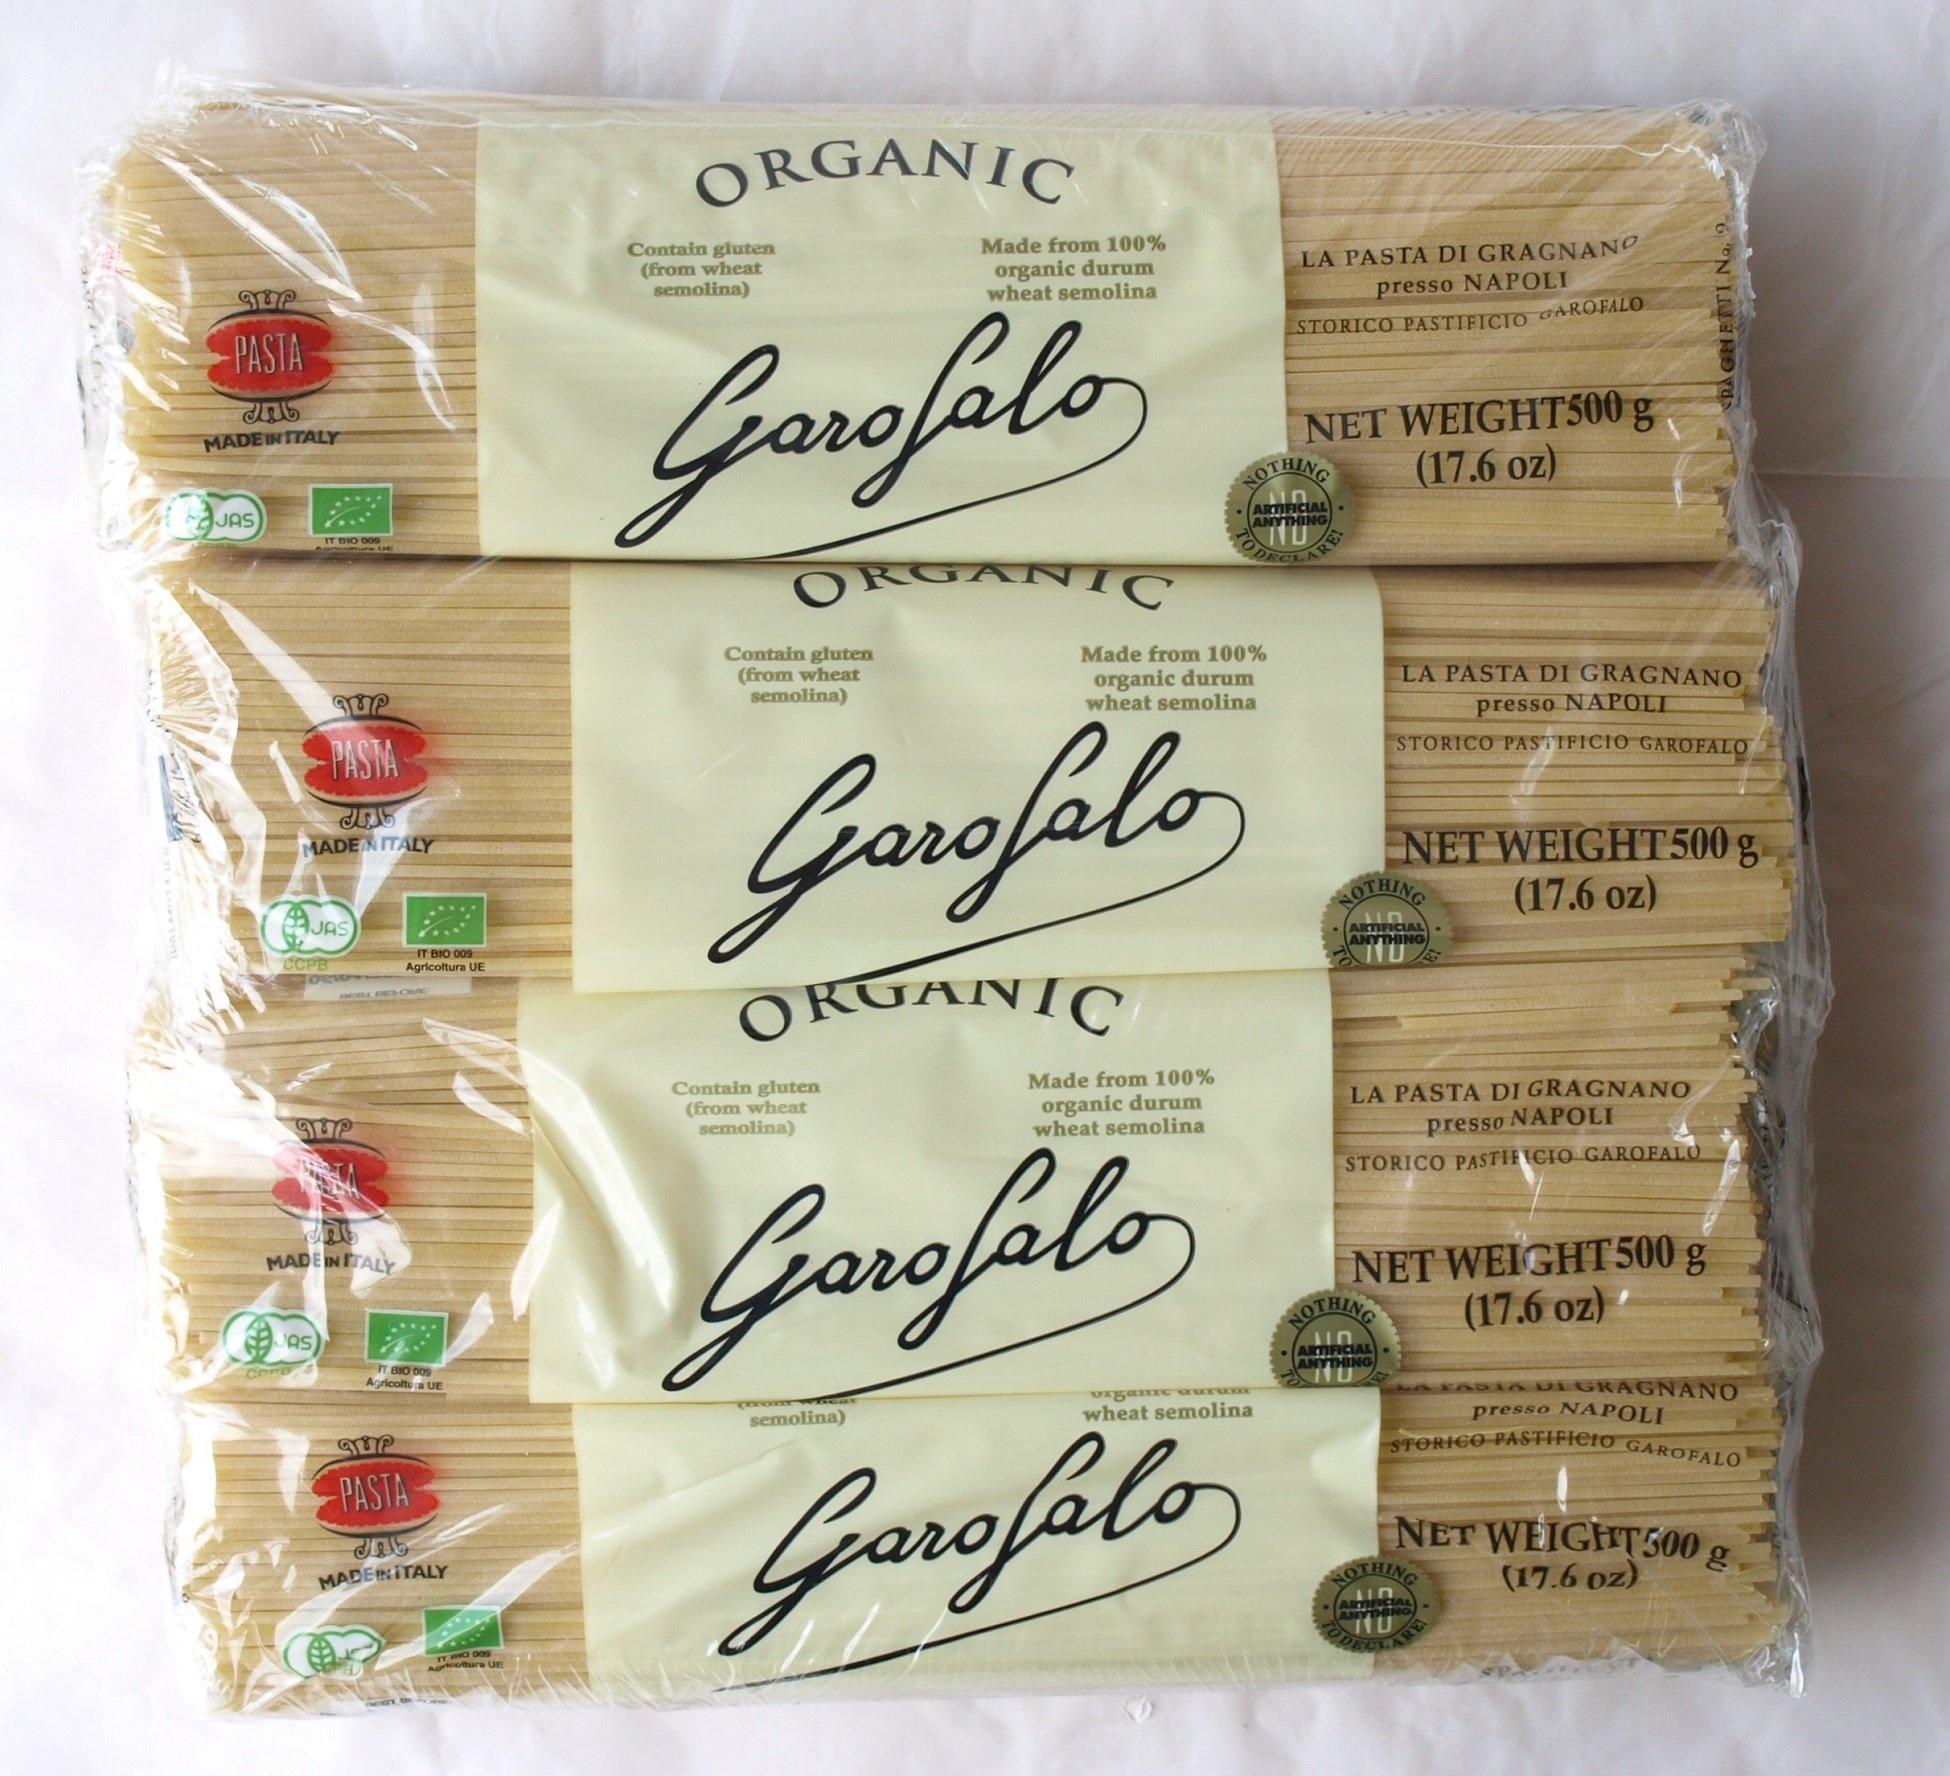 Garofalo, ORGANIC Spaghetti 8.8 lbs. (Pack of 8) by Garofalo (Image #1)